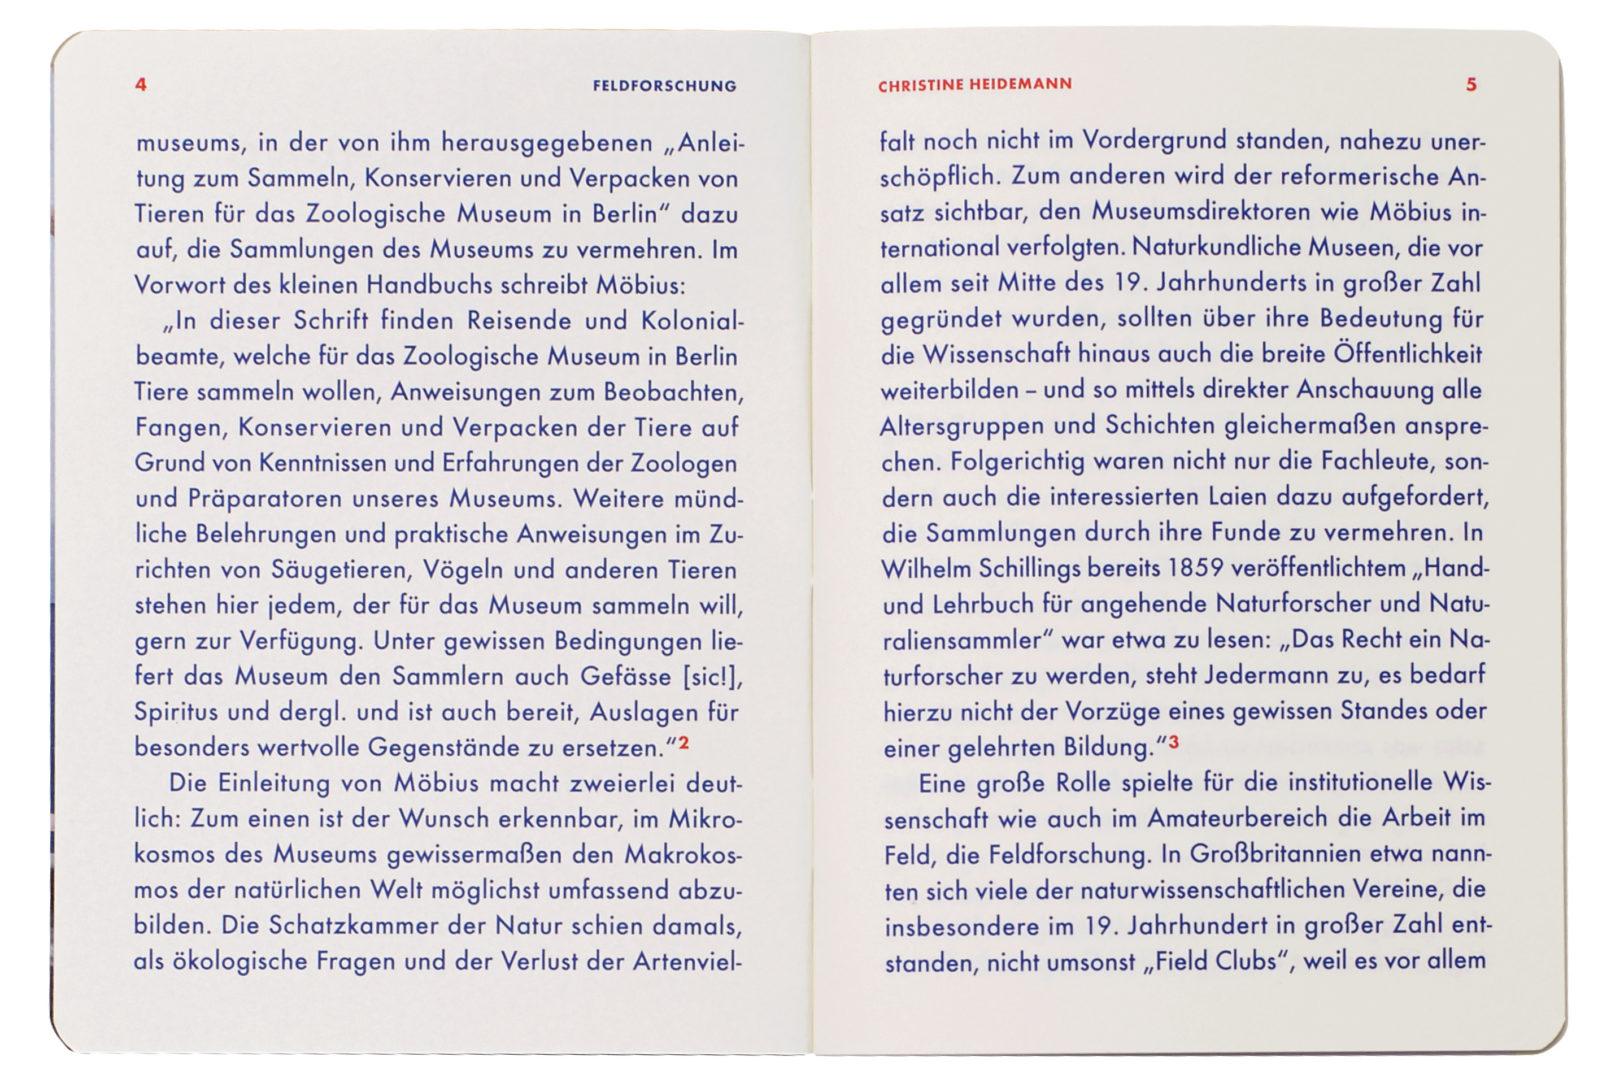 http://e-o-t.de/wordpress/wp-content/uploads/2018/12/eot-books-MarkDion-201810.jpg